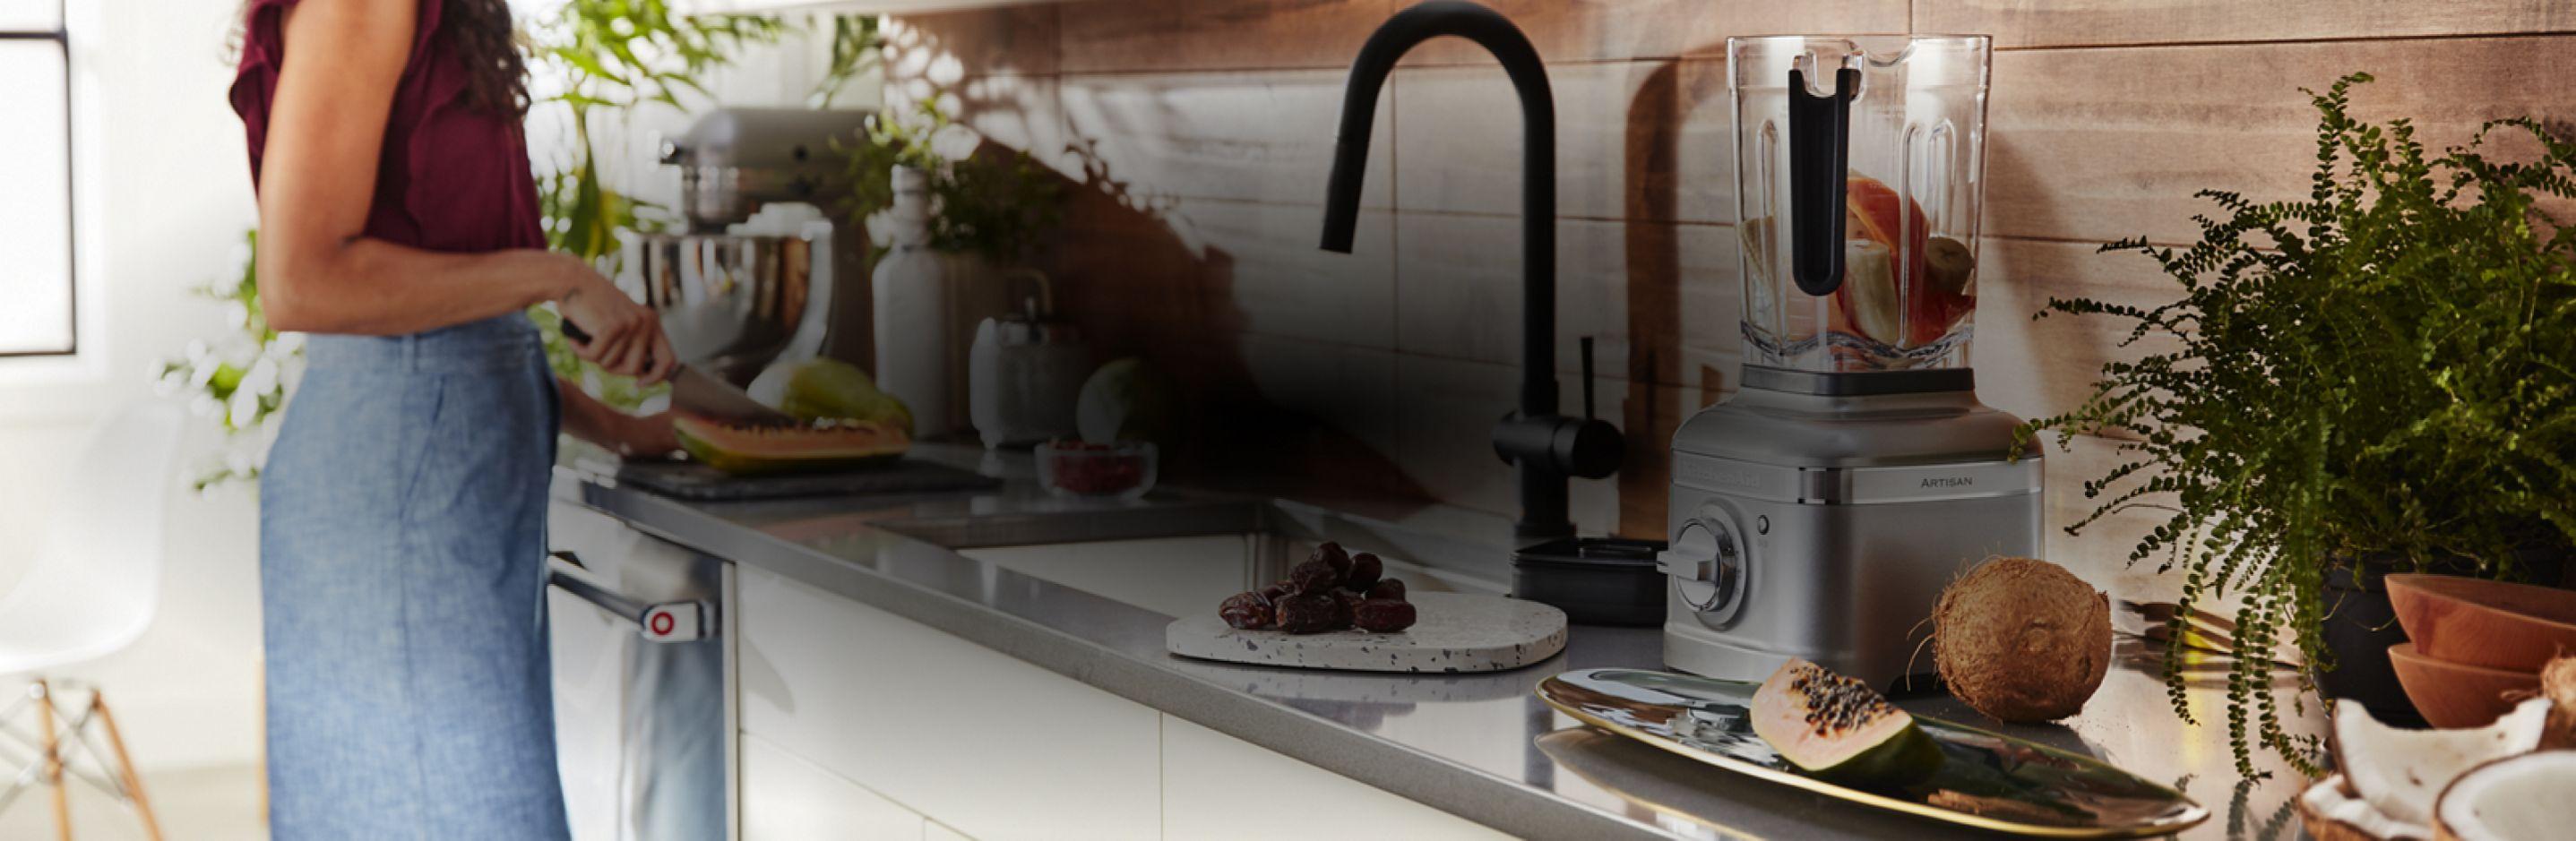 KitchenAid® Stand Mixer and Countertop Blender.